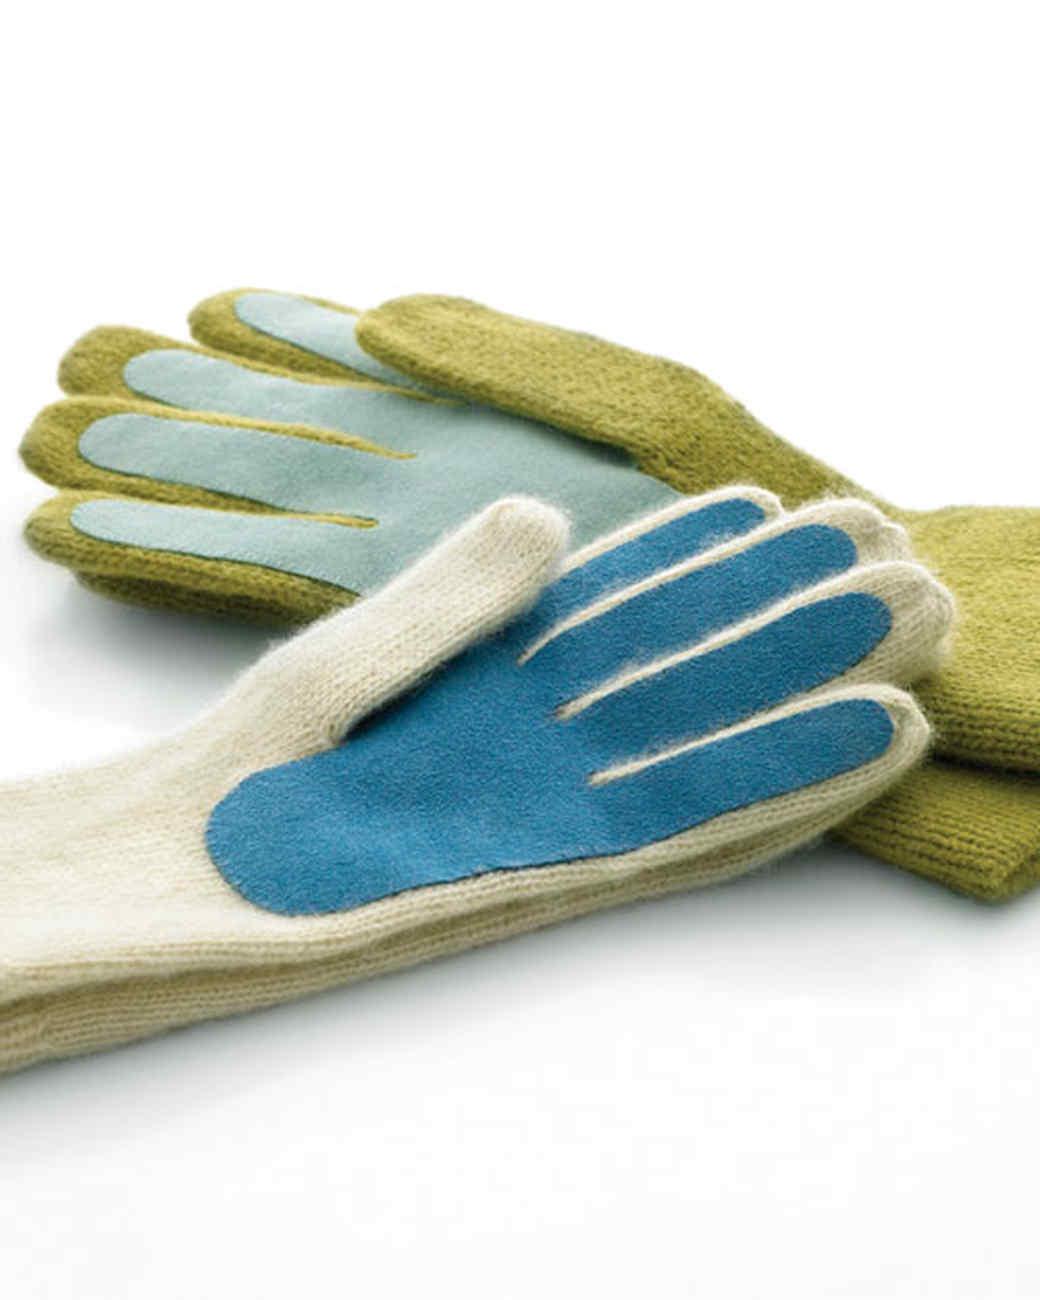 mla103022_0108_gloves.jpg